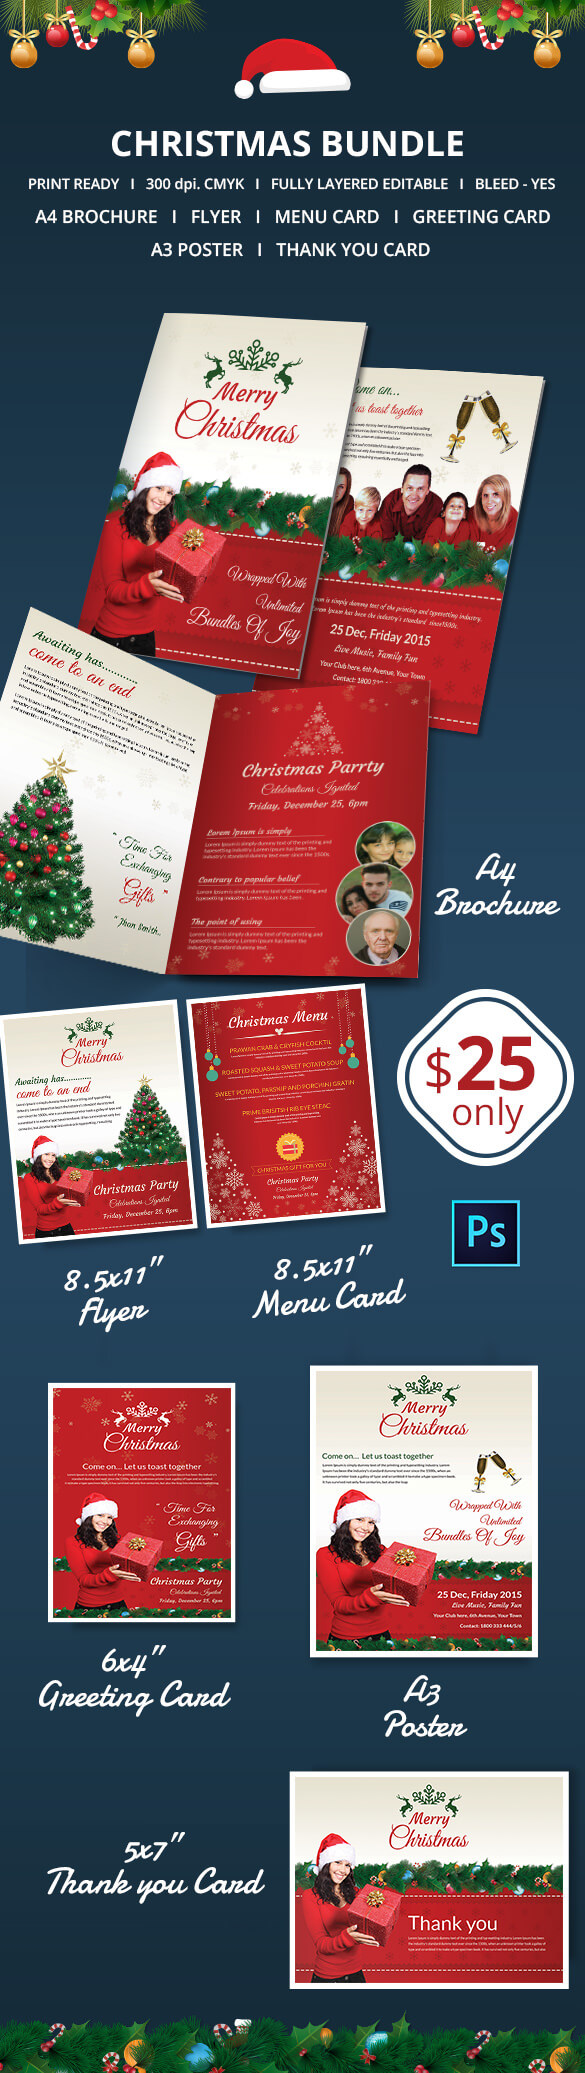 41+ Christmas Brochures Templates - Psd, Word, Publisher With Christmas Brochure Templates Free